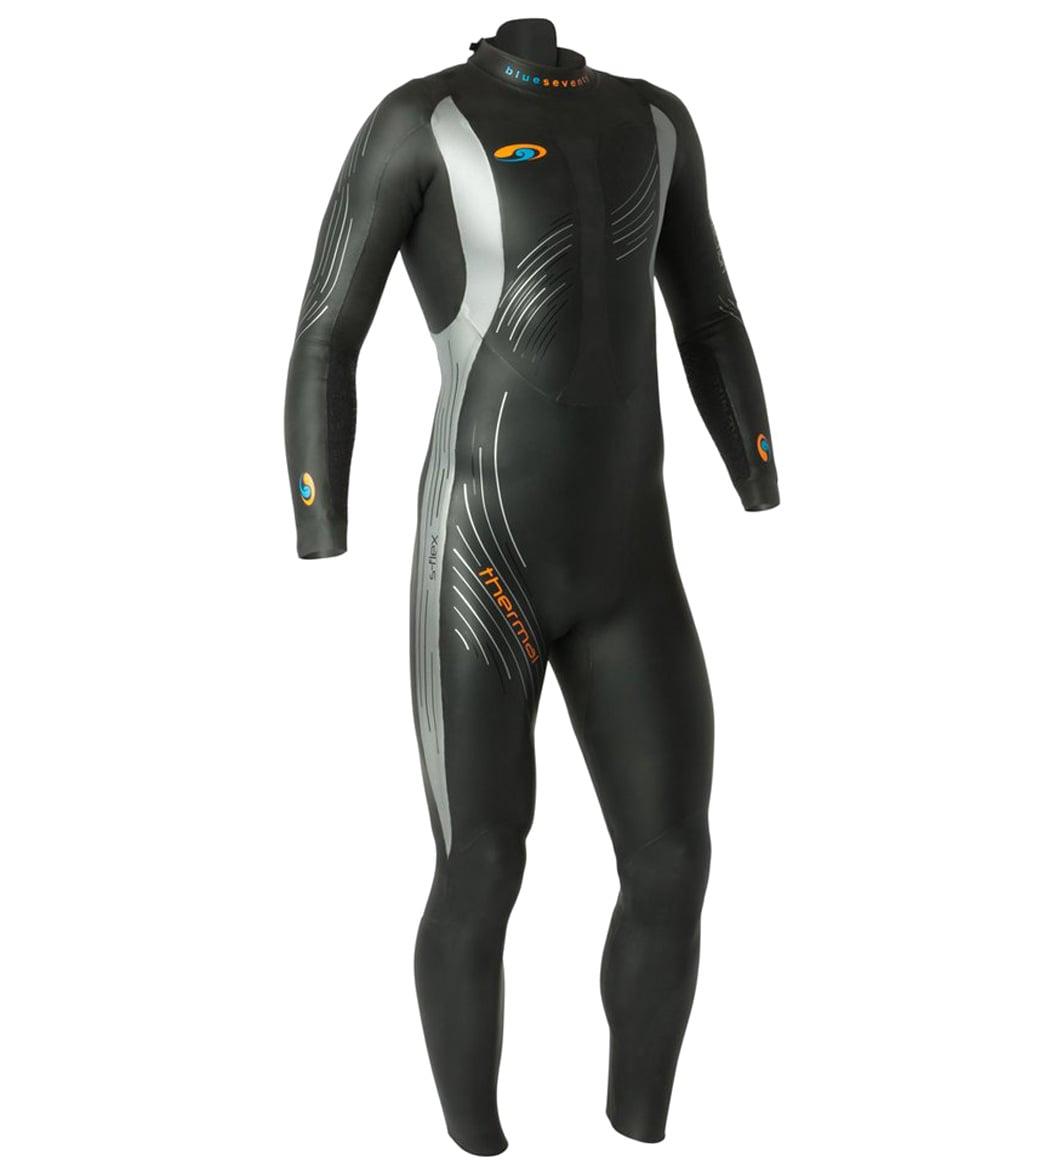 Blueseventy Men's Thermal Reaction Triathlon Wetsuit